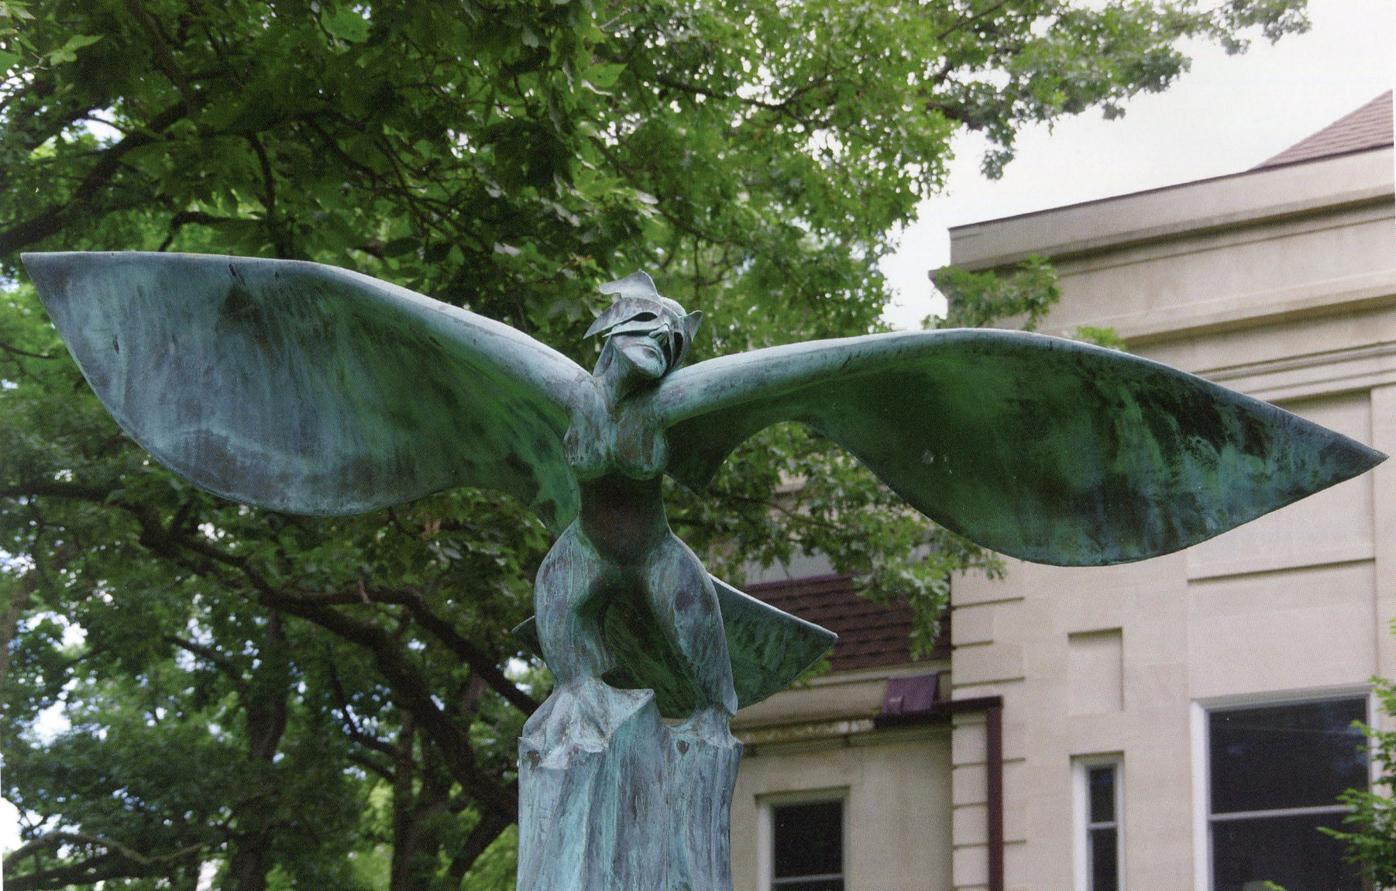 Siren sculpture